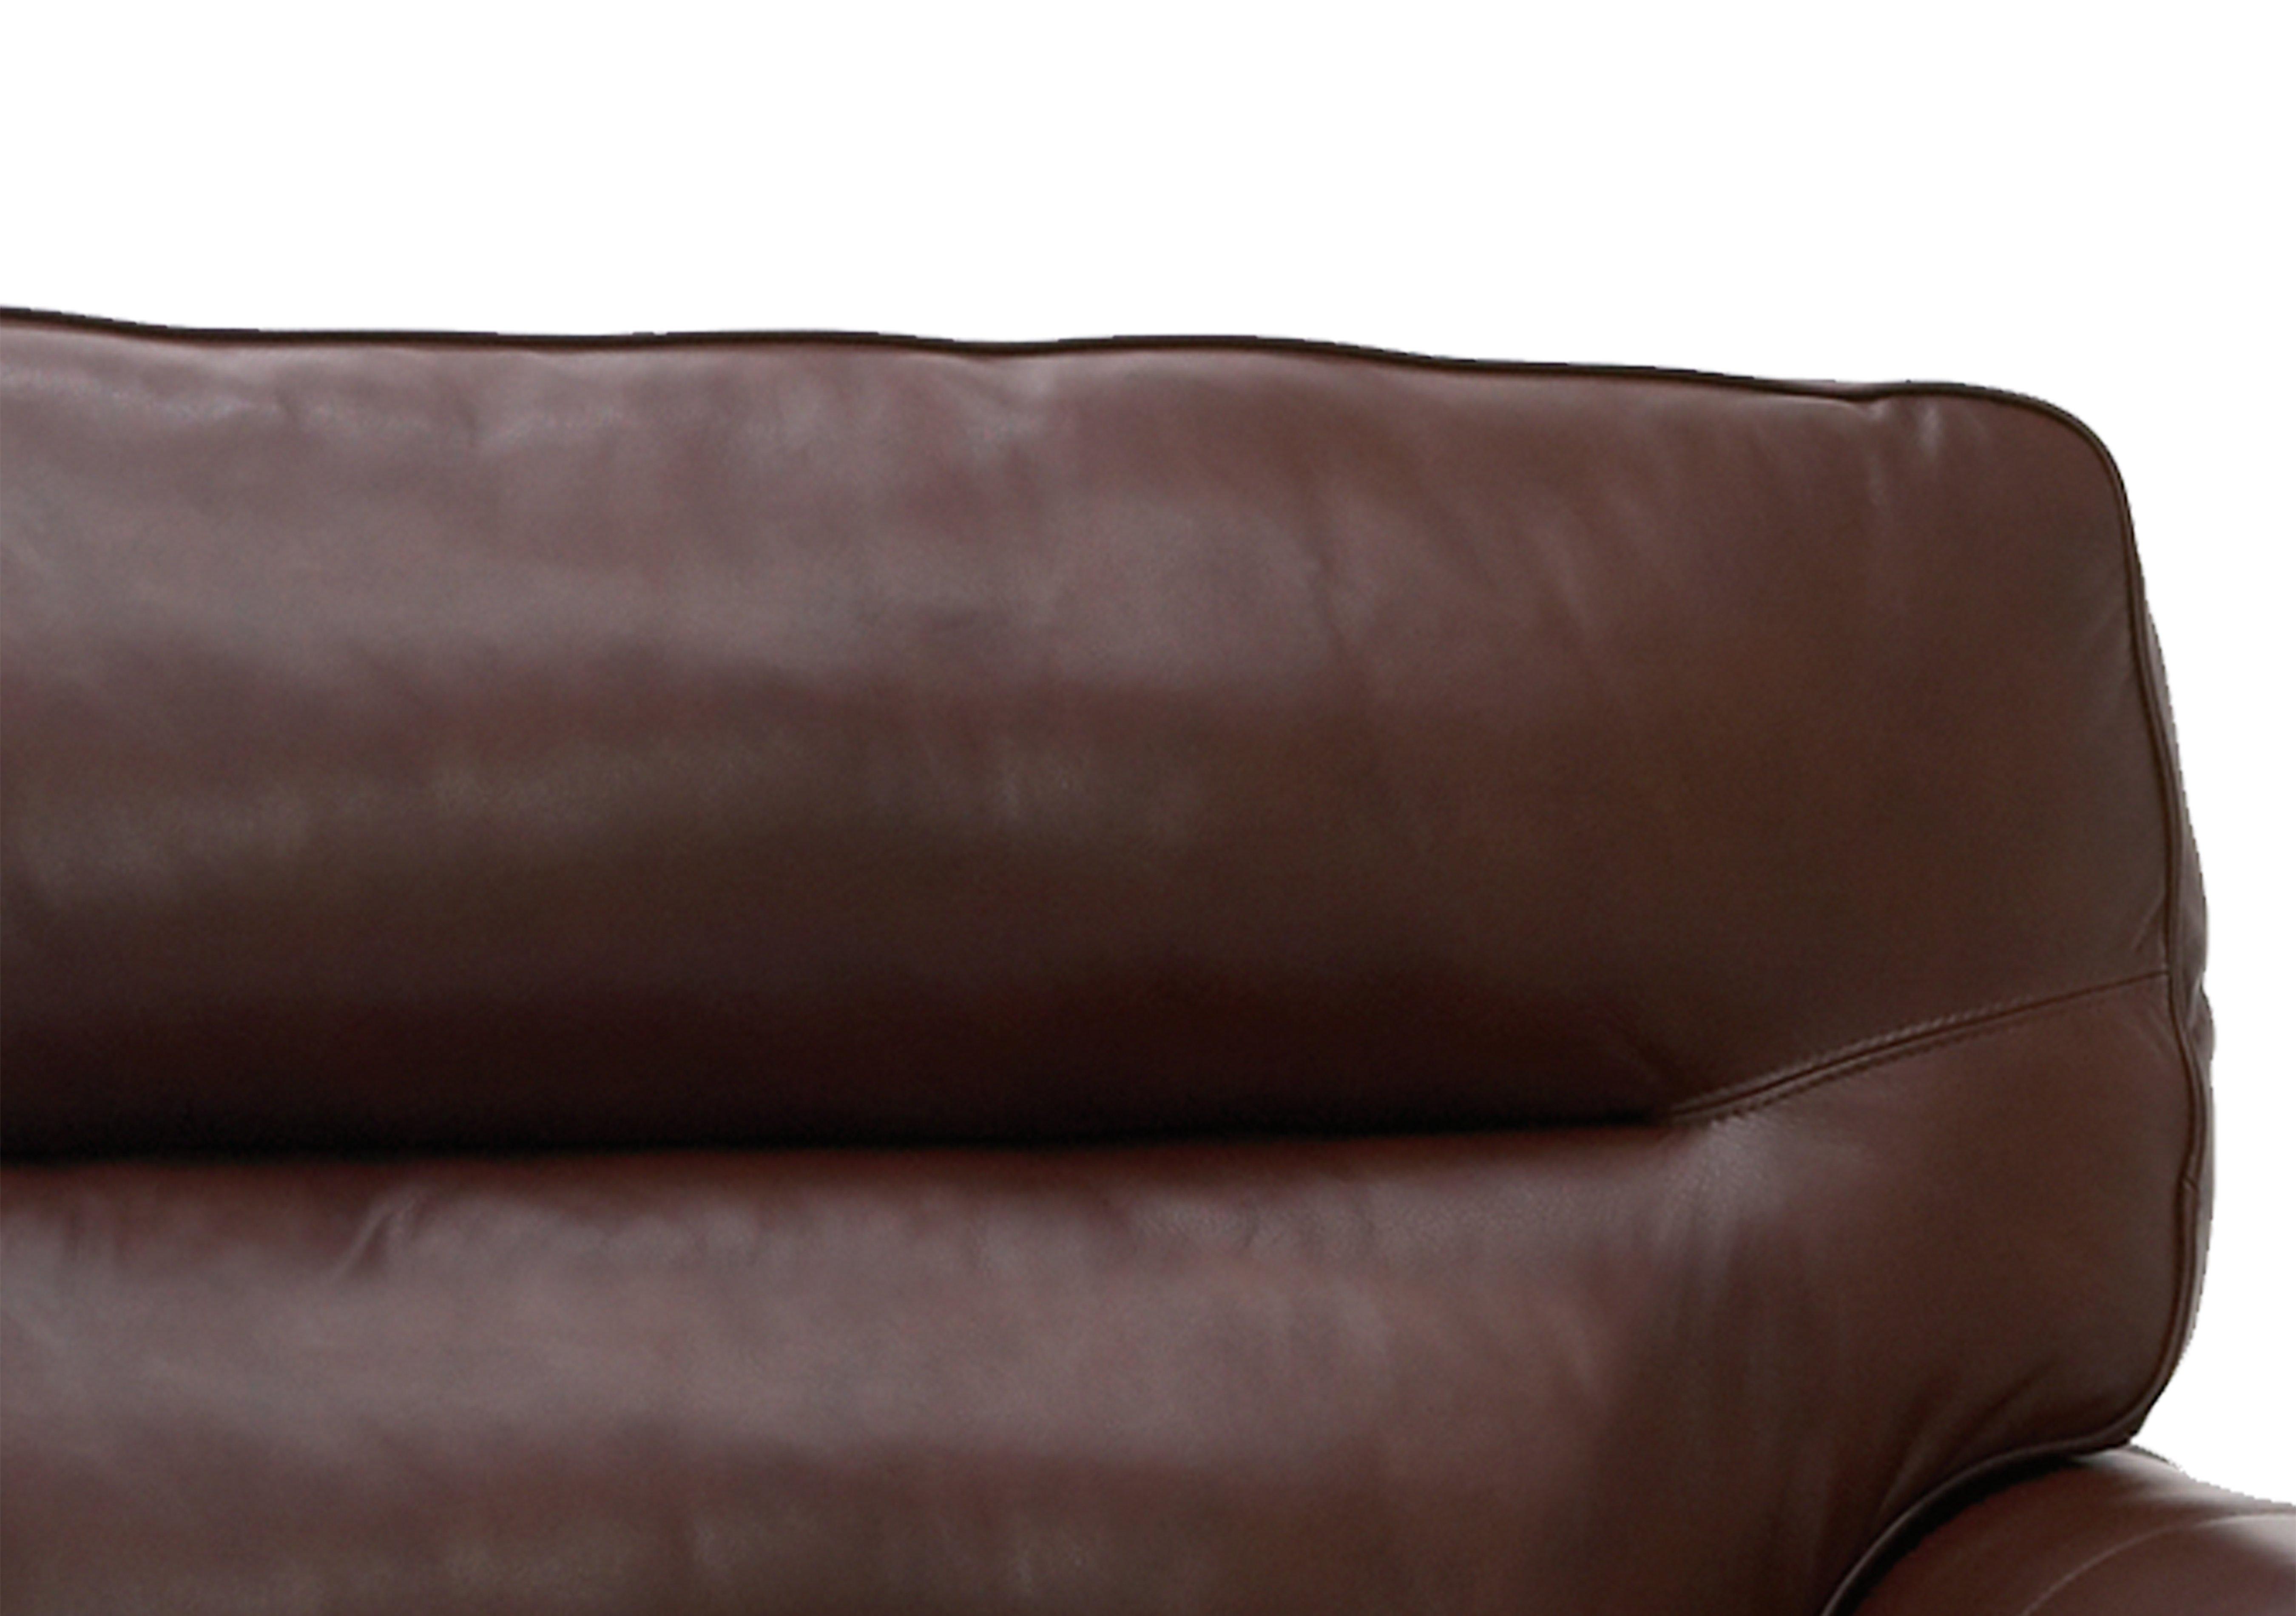 Gemma 2 Seater Leather Sofa G Plan Furniture Village